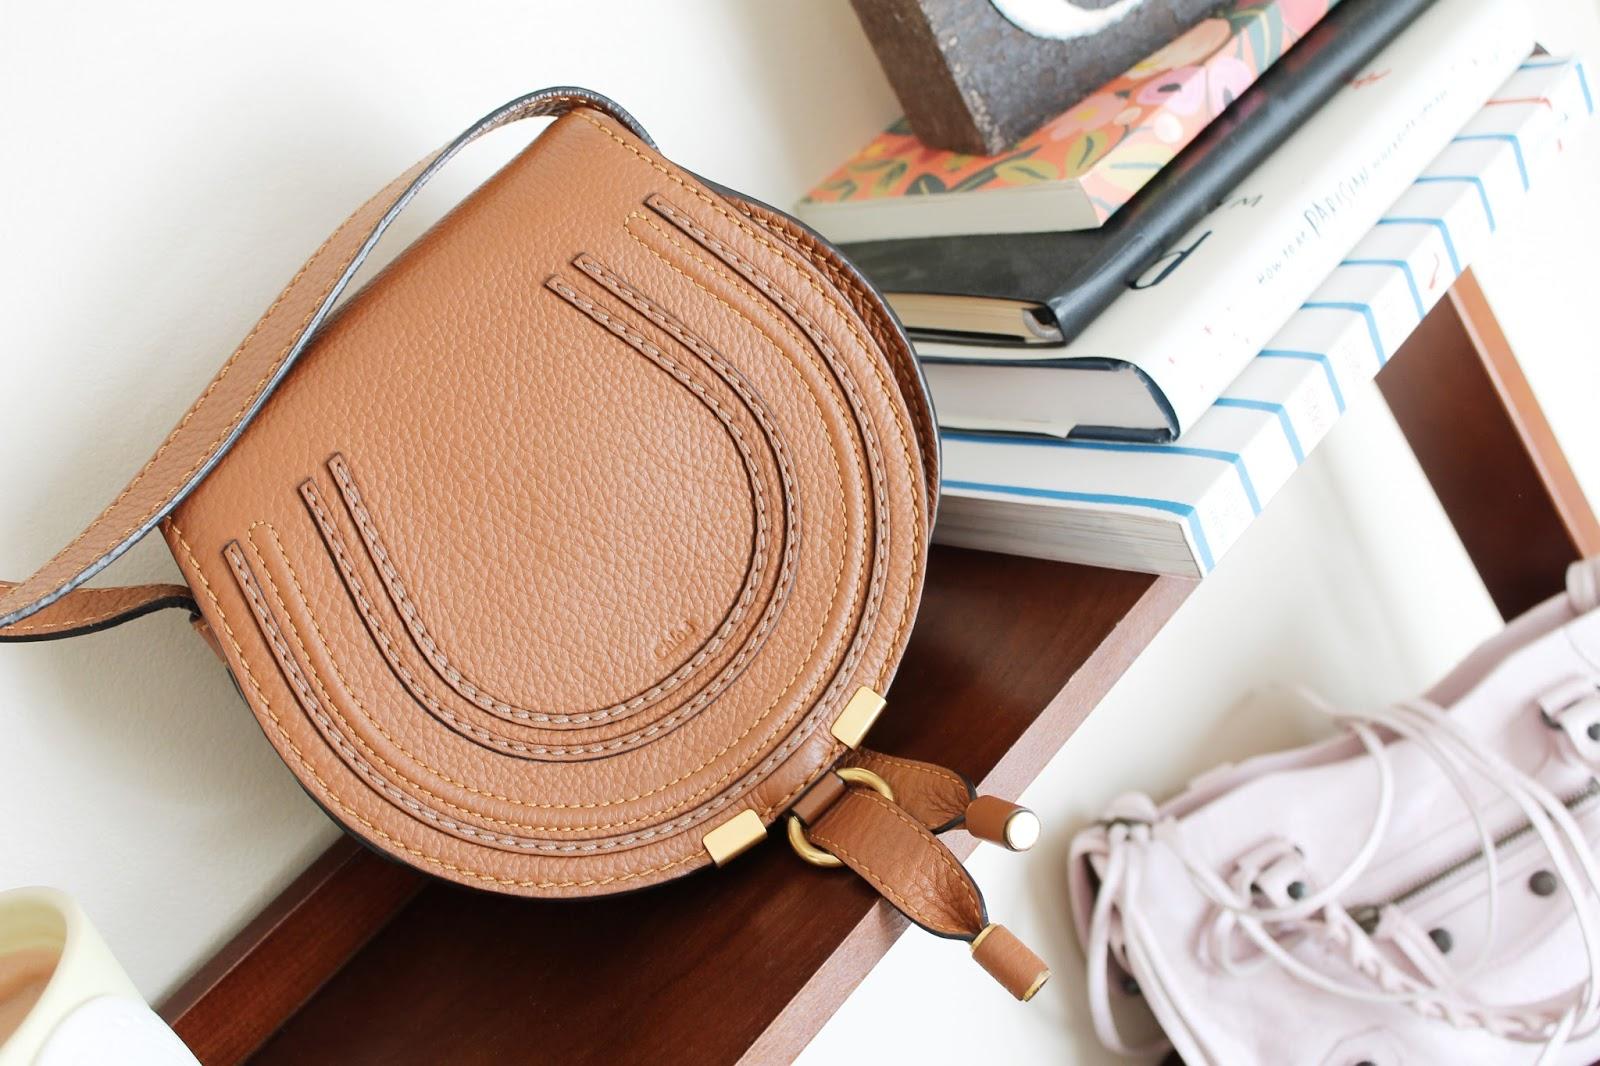 Some Handbag Favorites